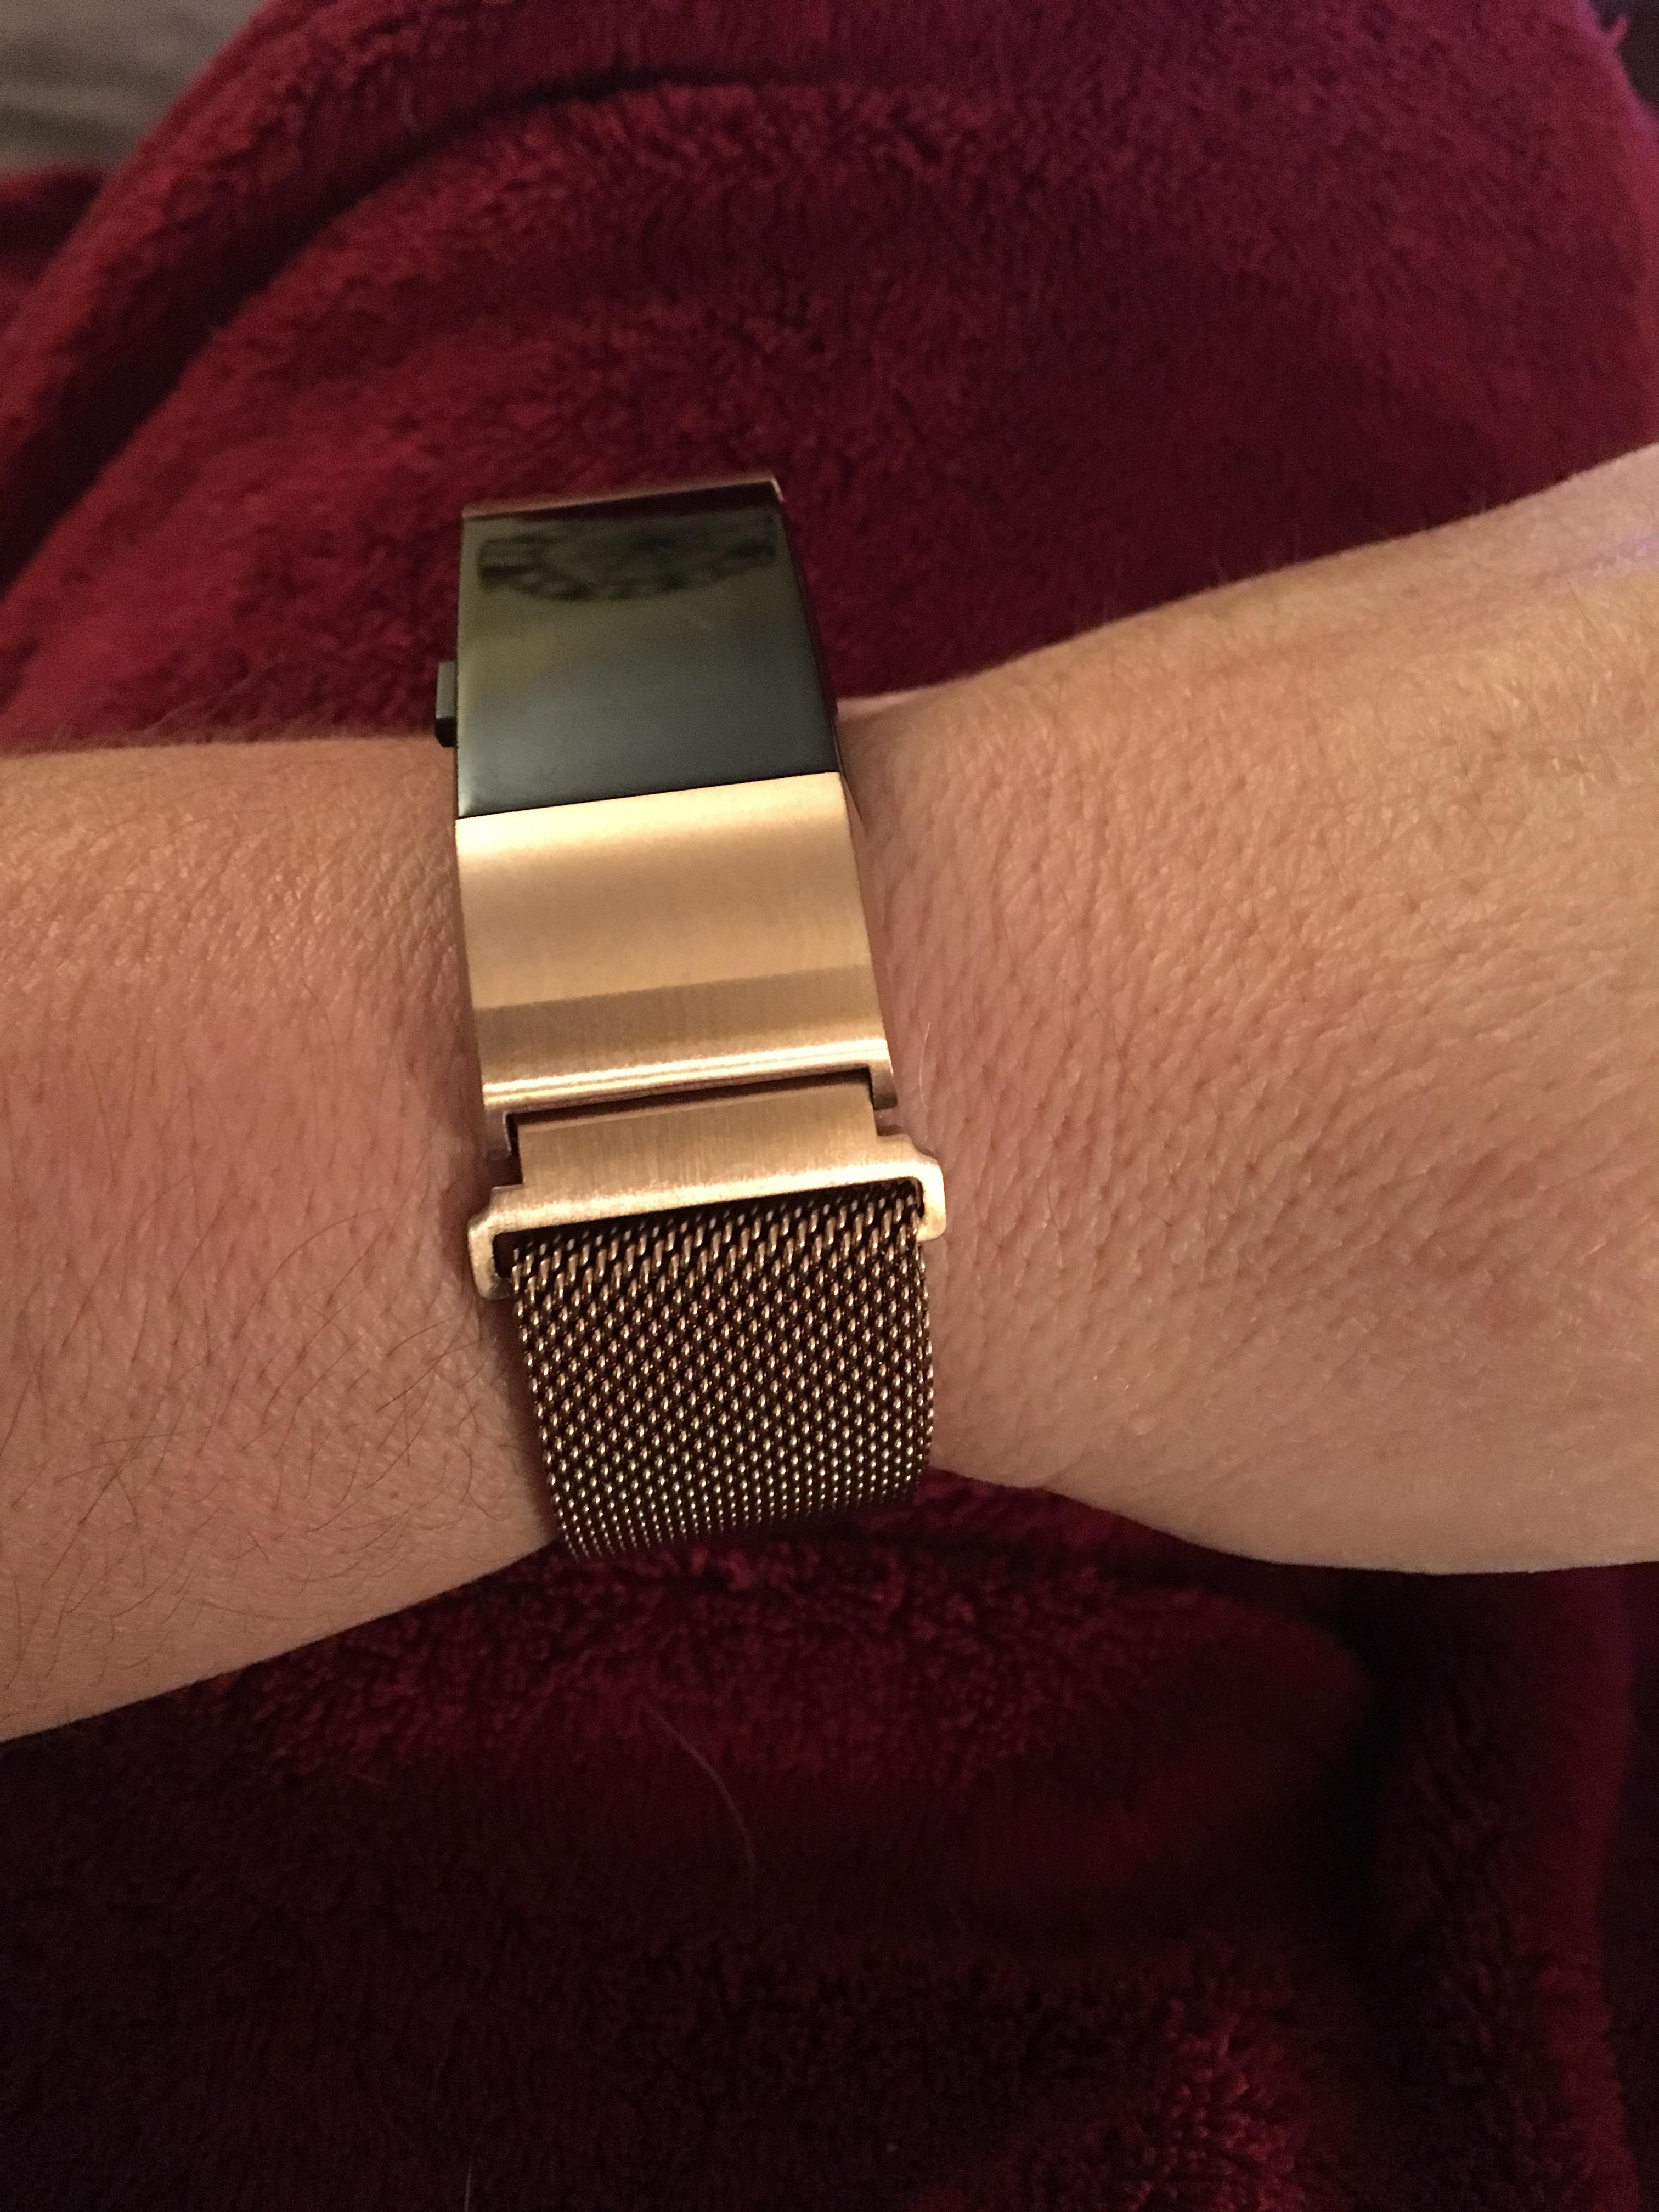 Watch marks on wrist - Watch Marks On Wrist 72